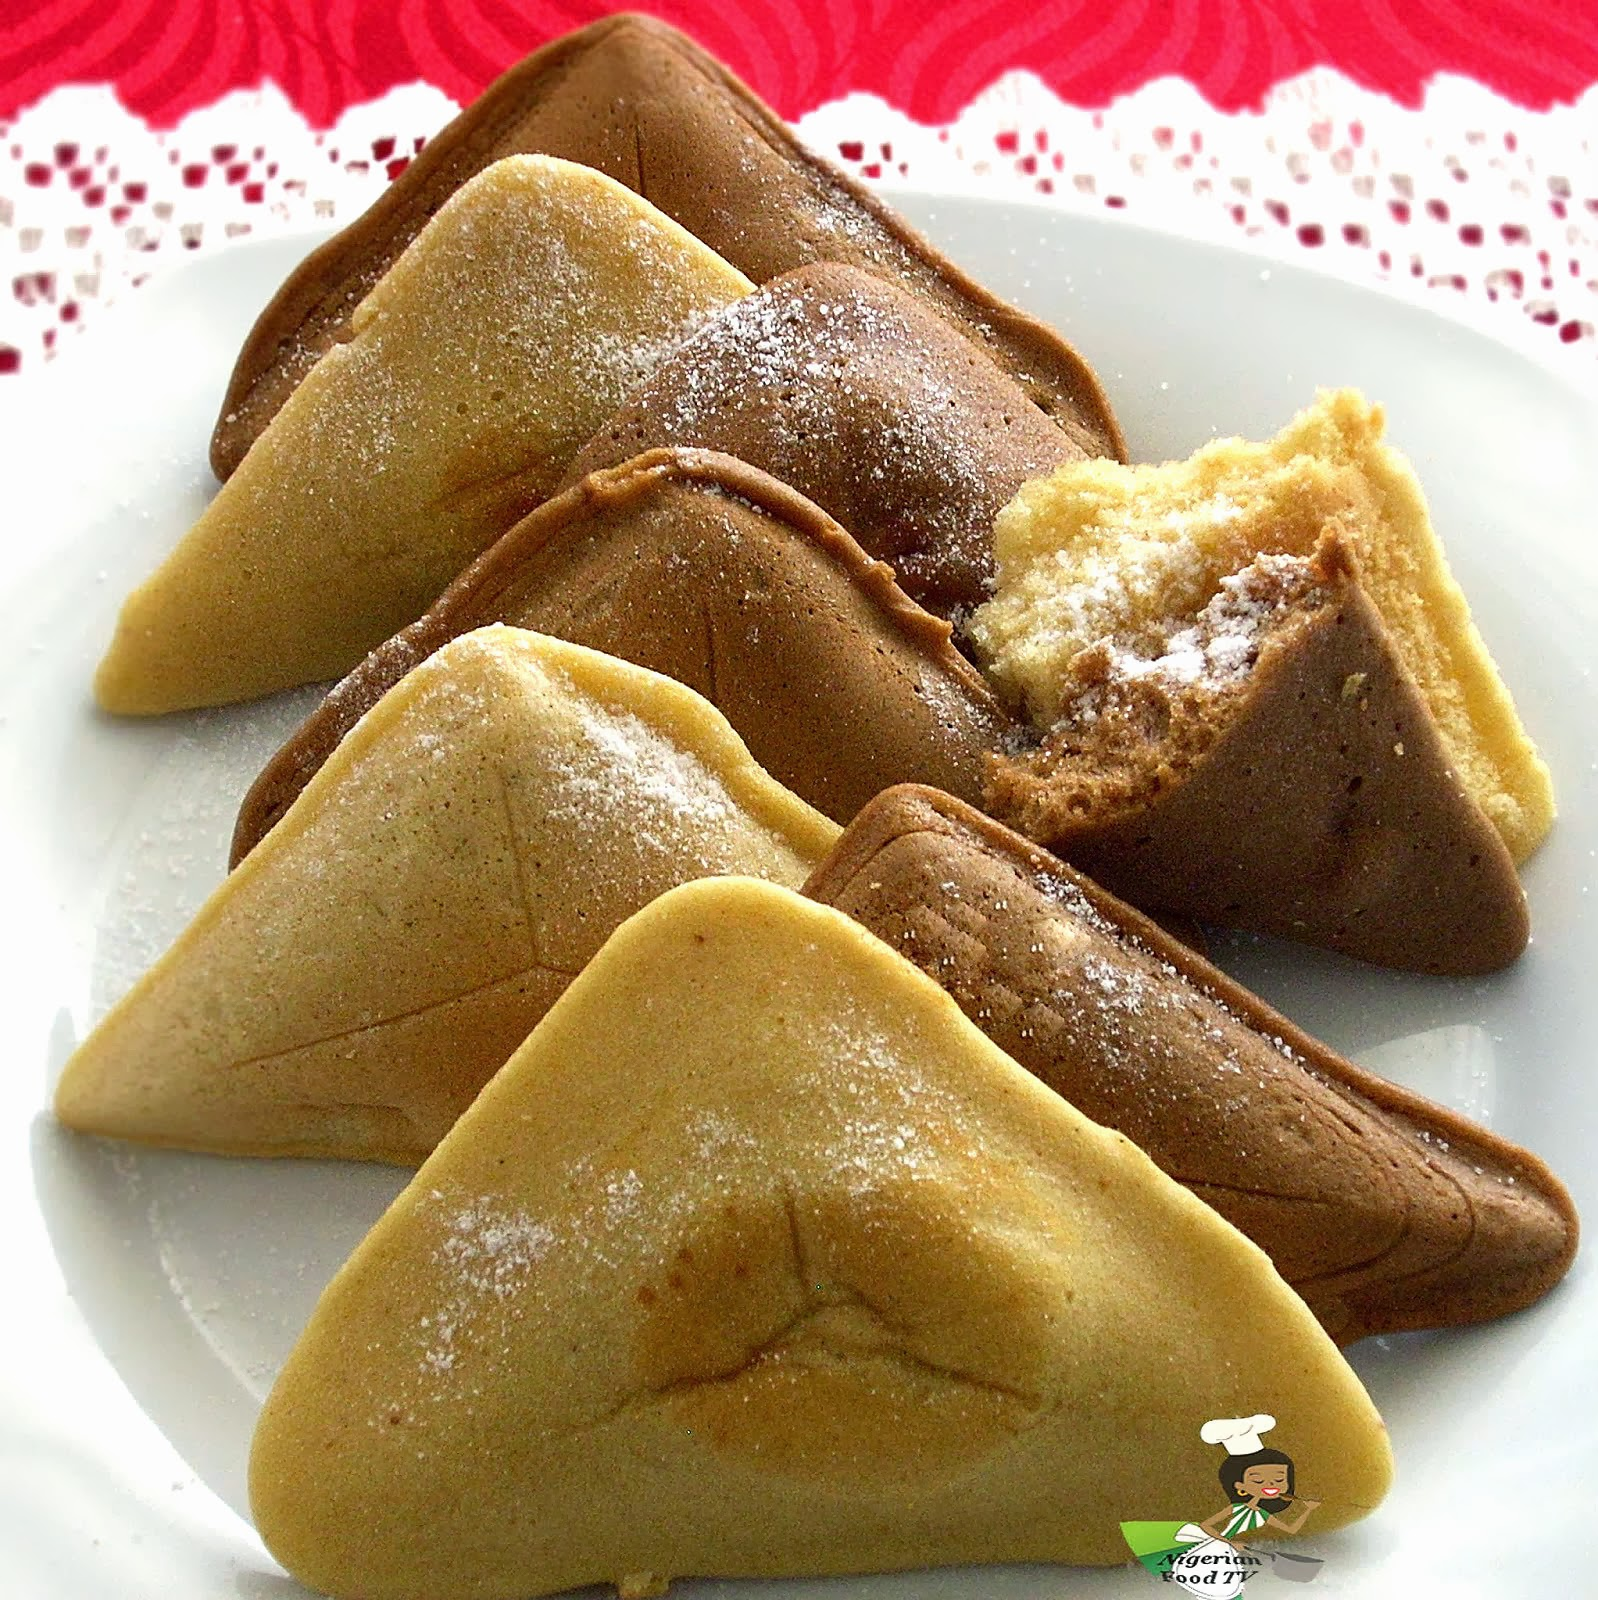 nigerian cake, Nigerian Small Chops Recipes